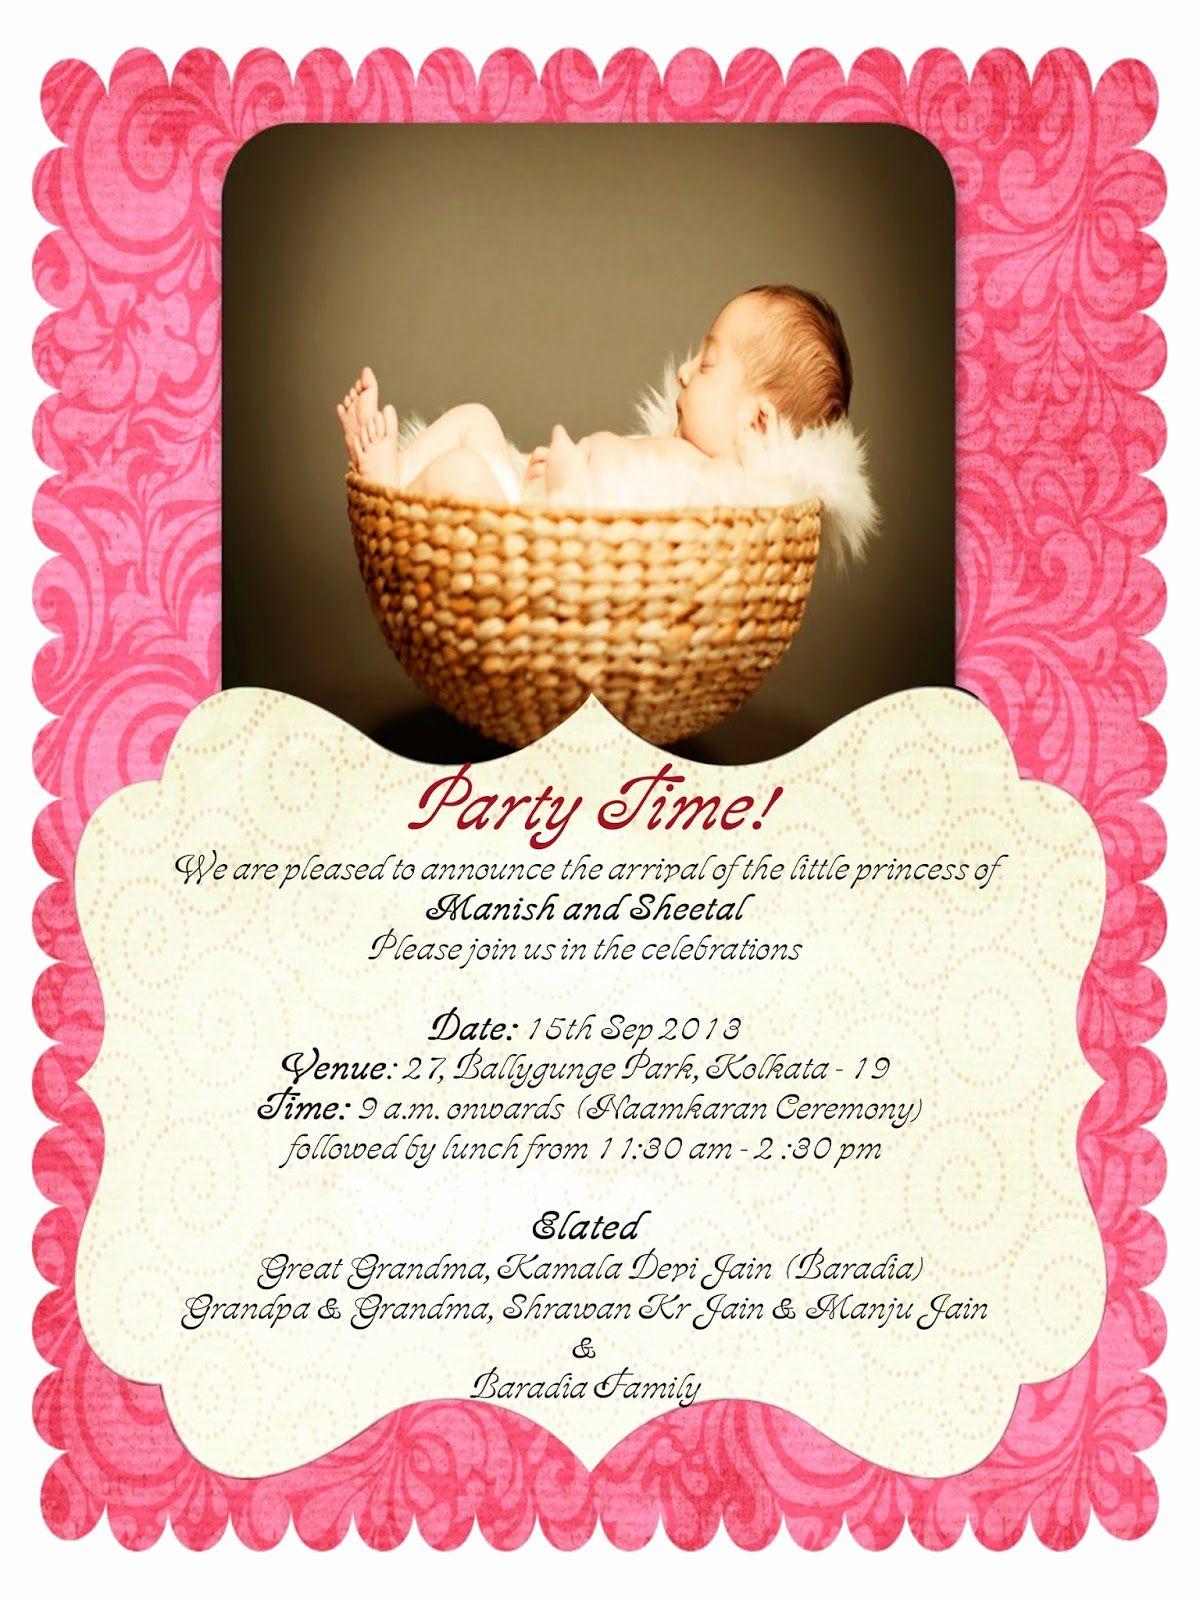 Baby Naming Ceremony Invitation Awesome Rakhi Jain Naming Ceremony Invitation Cradle Ceremony Naming Ceremony